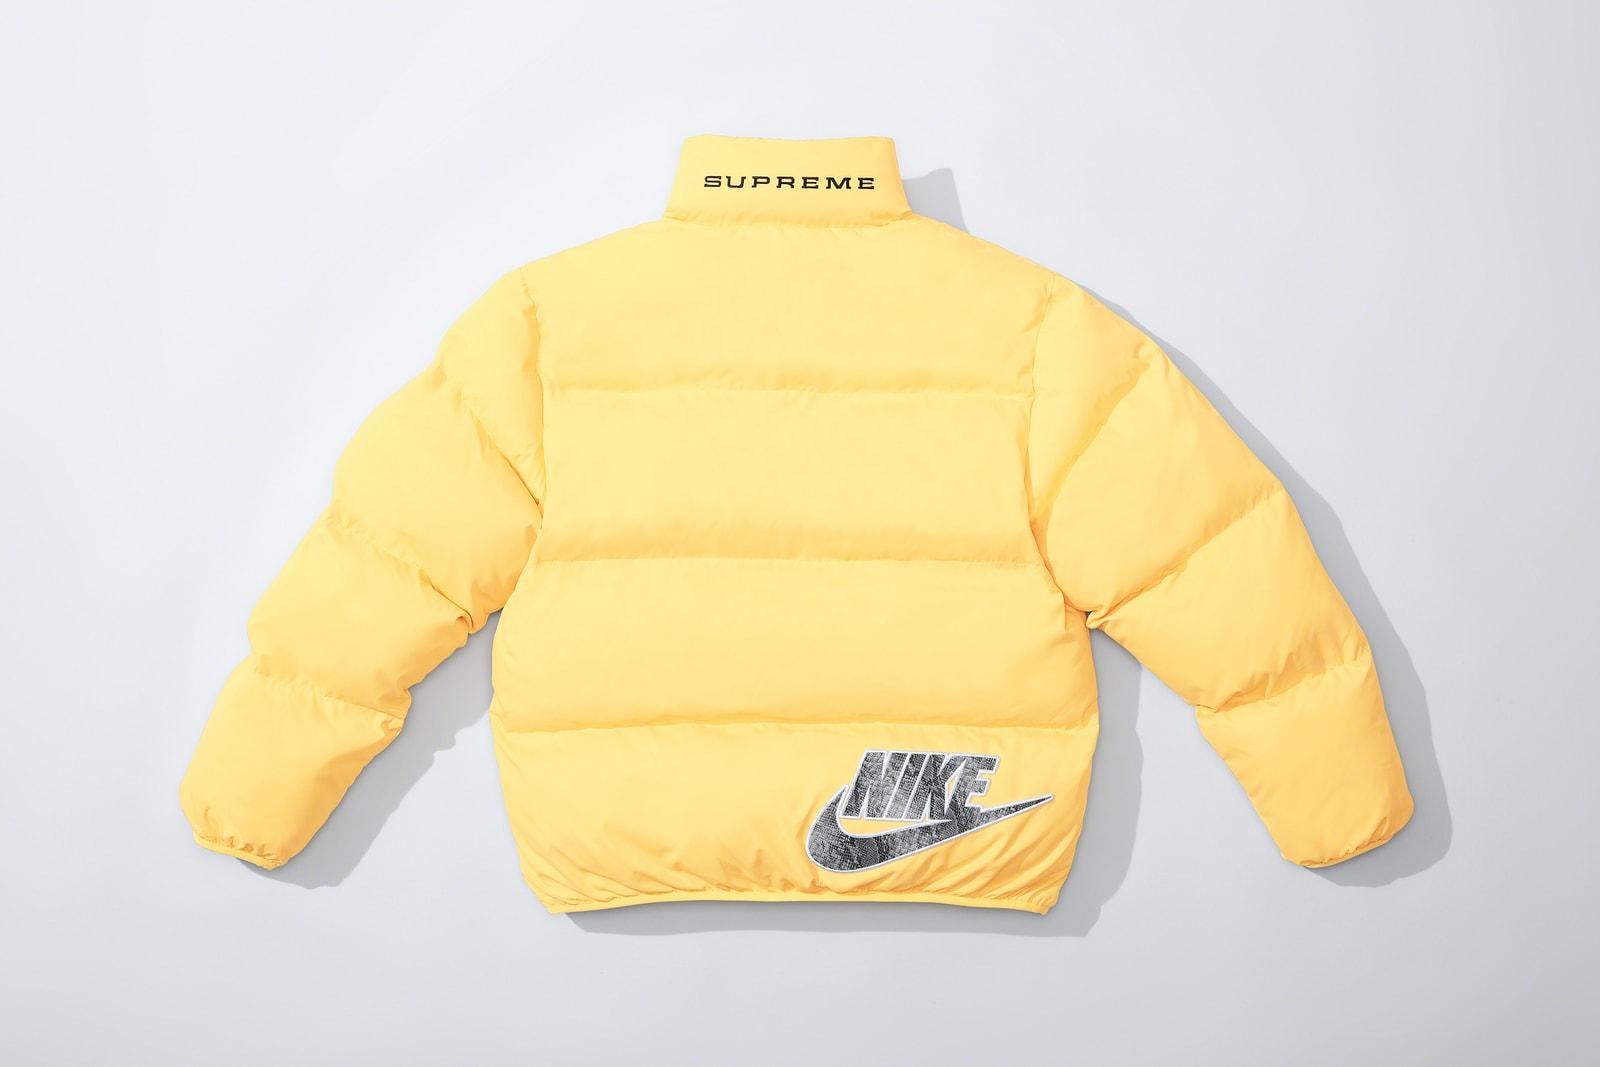 Supreme x Nike 2021 春夏聯乘系列正式發佈